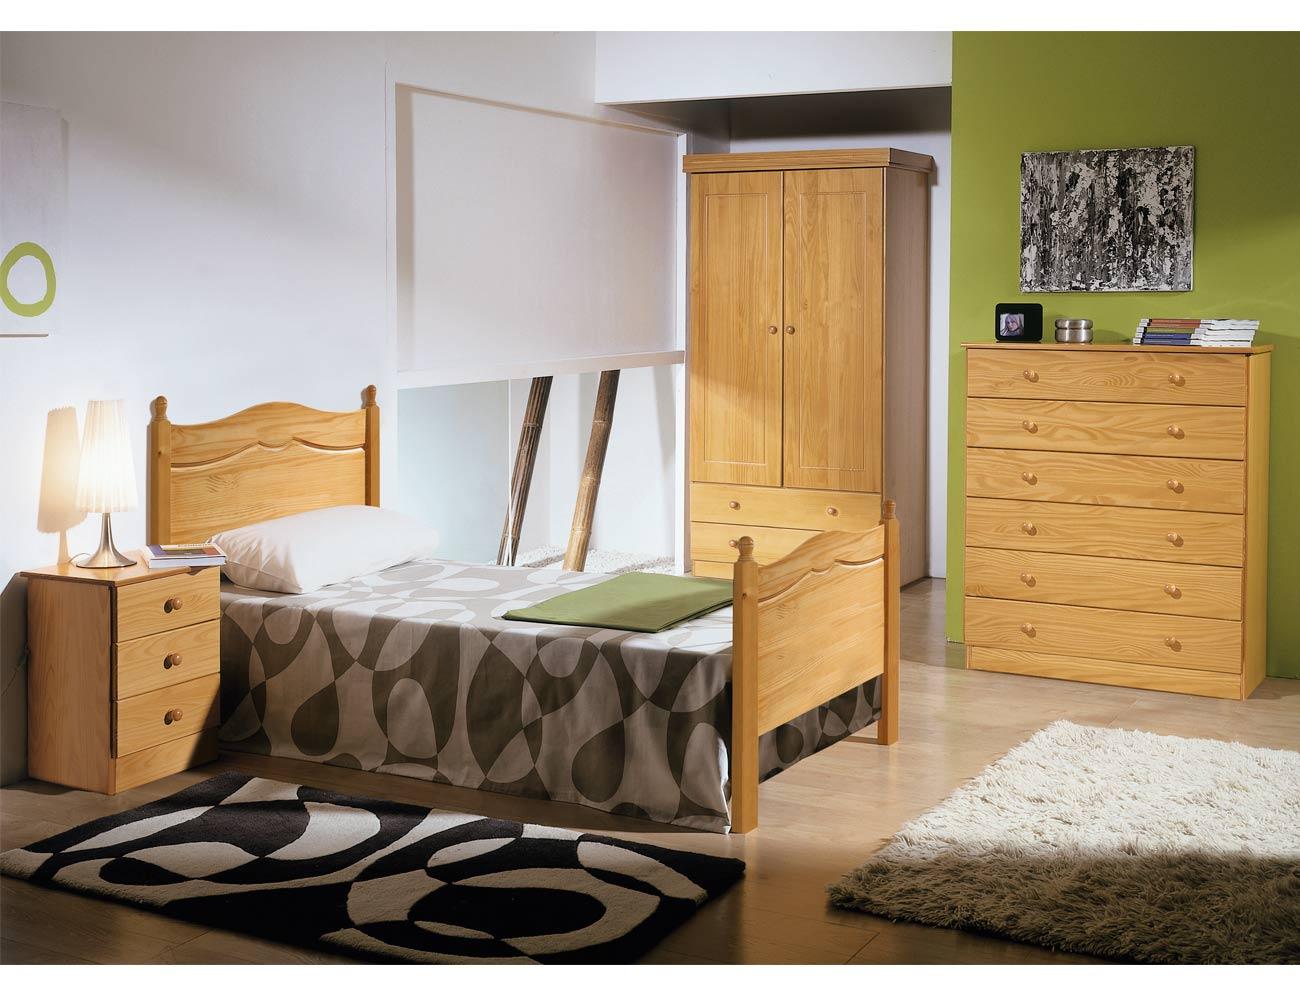 Dormitorio juvenil malaga madera pino provenzal